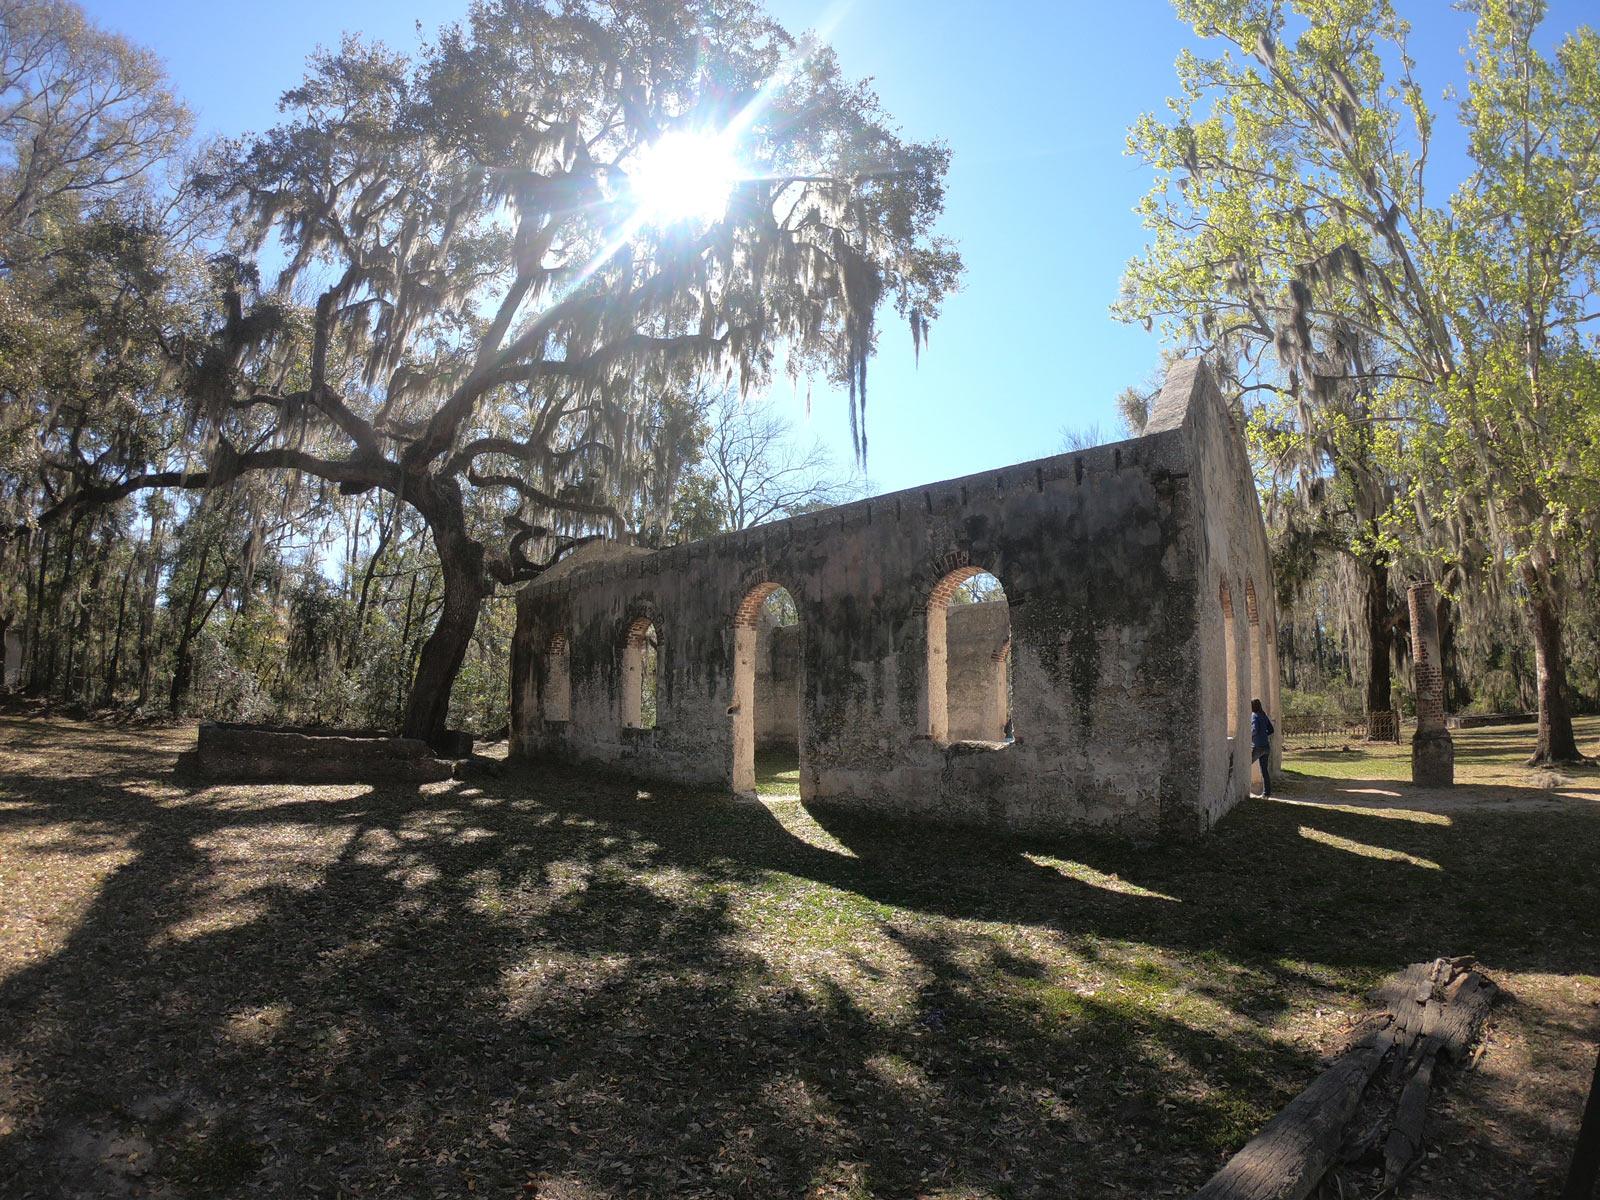 Ruins under Spanish moss laden live oak tree called Saint Helena Chapel of Ease outside of Beaufort, SC